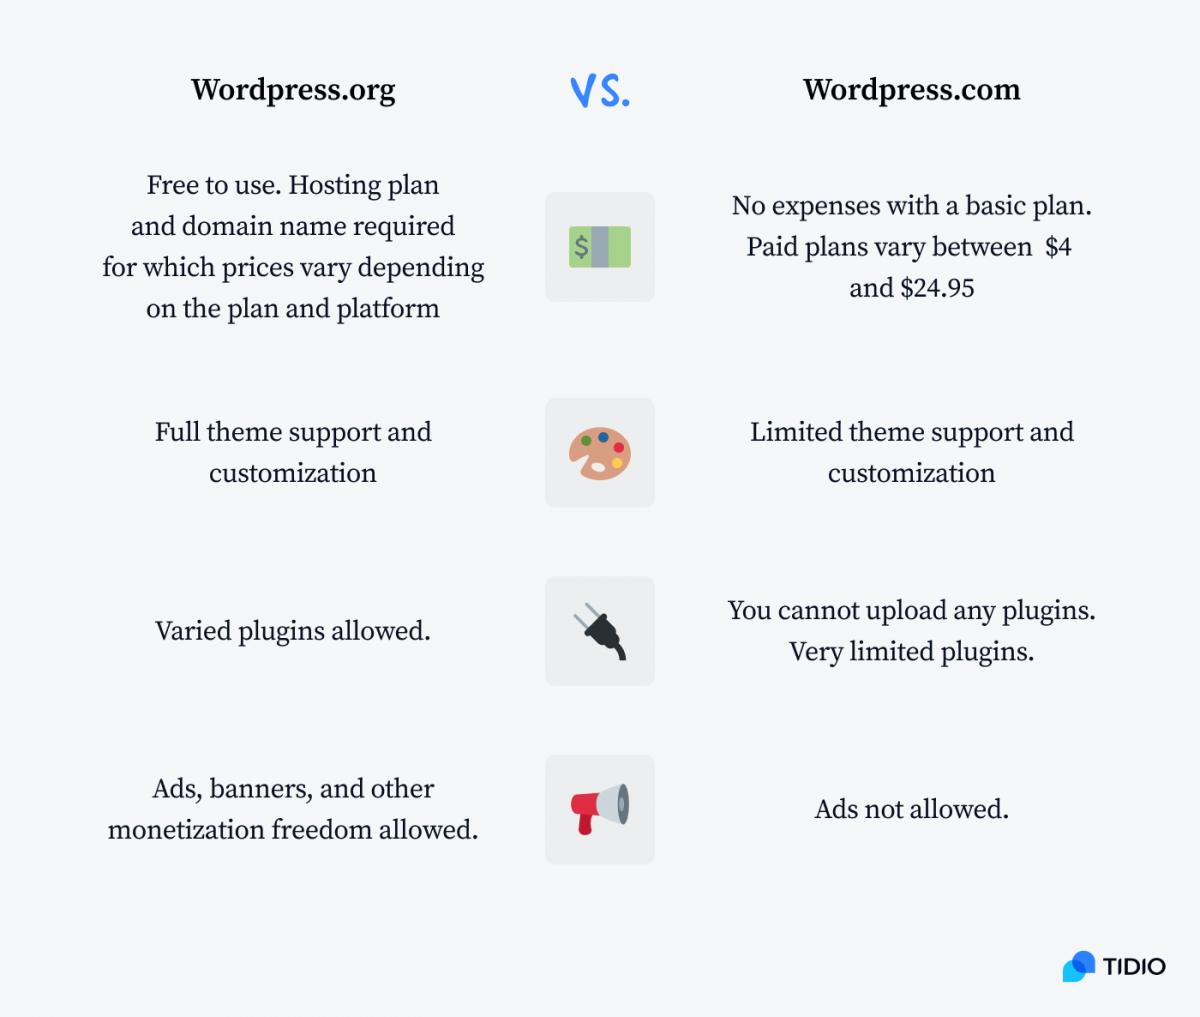 WordPress.org vs. WordPress.com comparison table